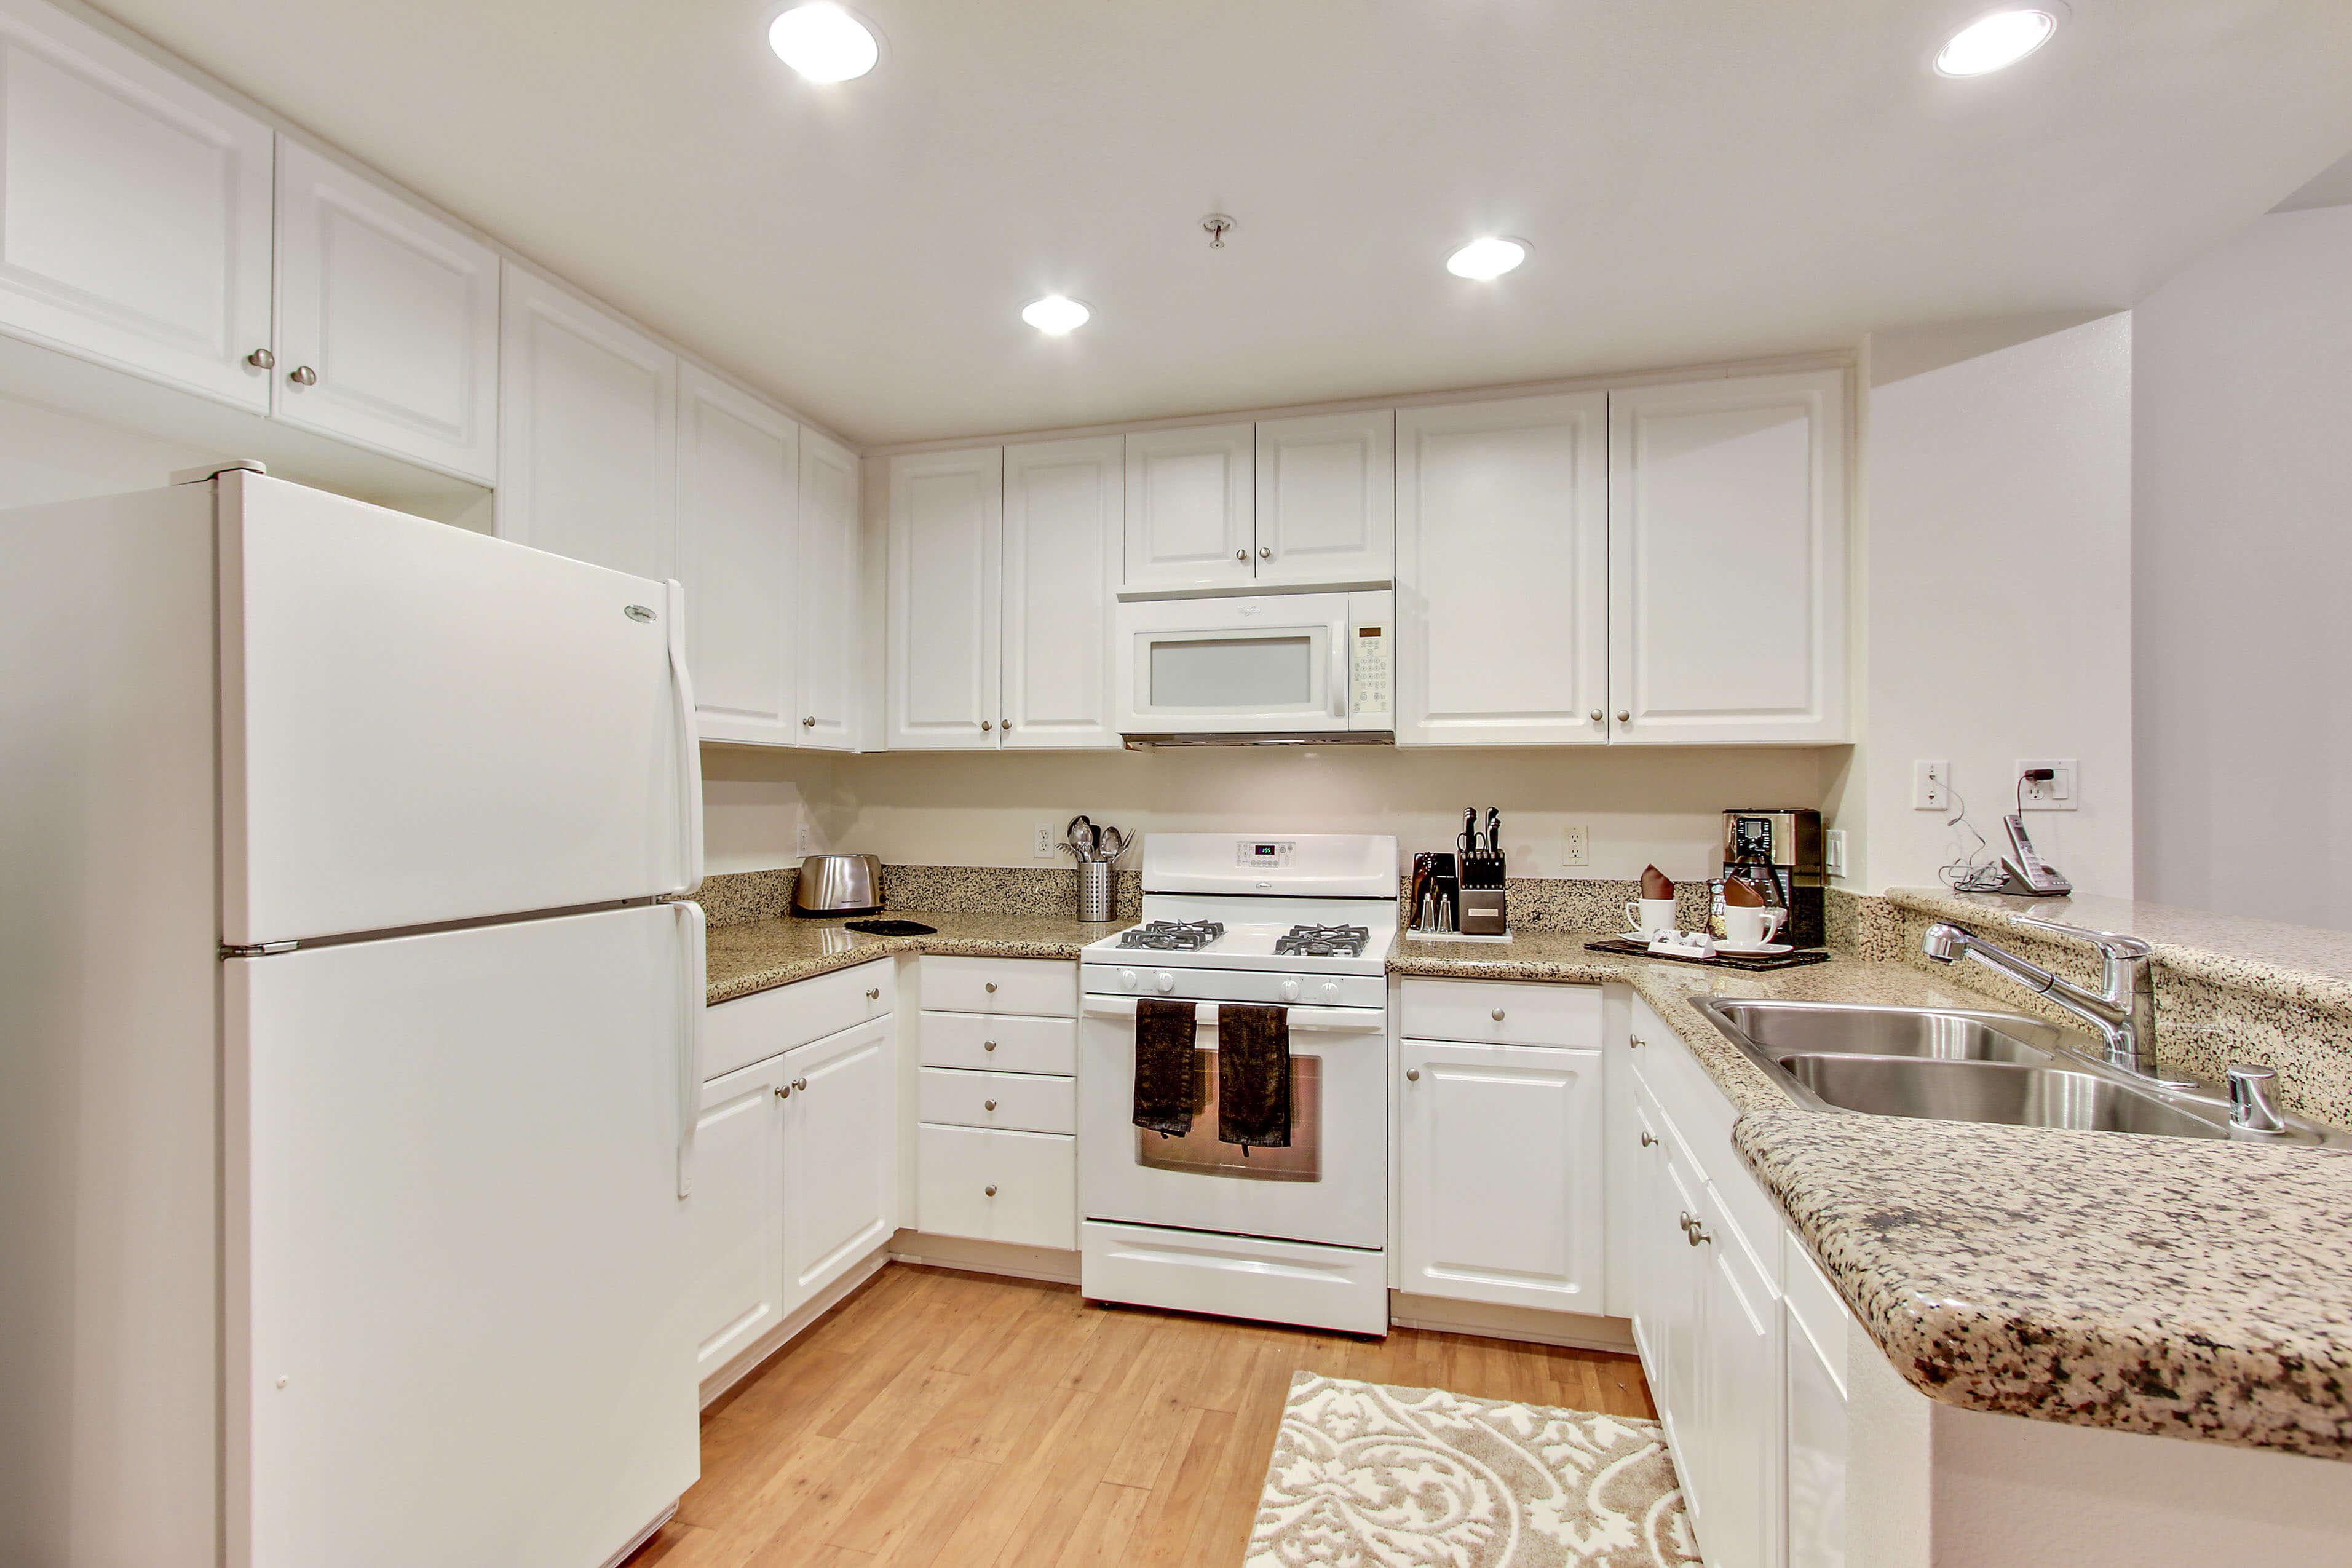 1 Bedroom Apartments For Rent In Orange County 28 Images 1 Bedroom Apartments For Rent In